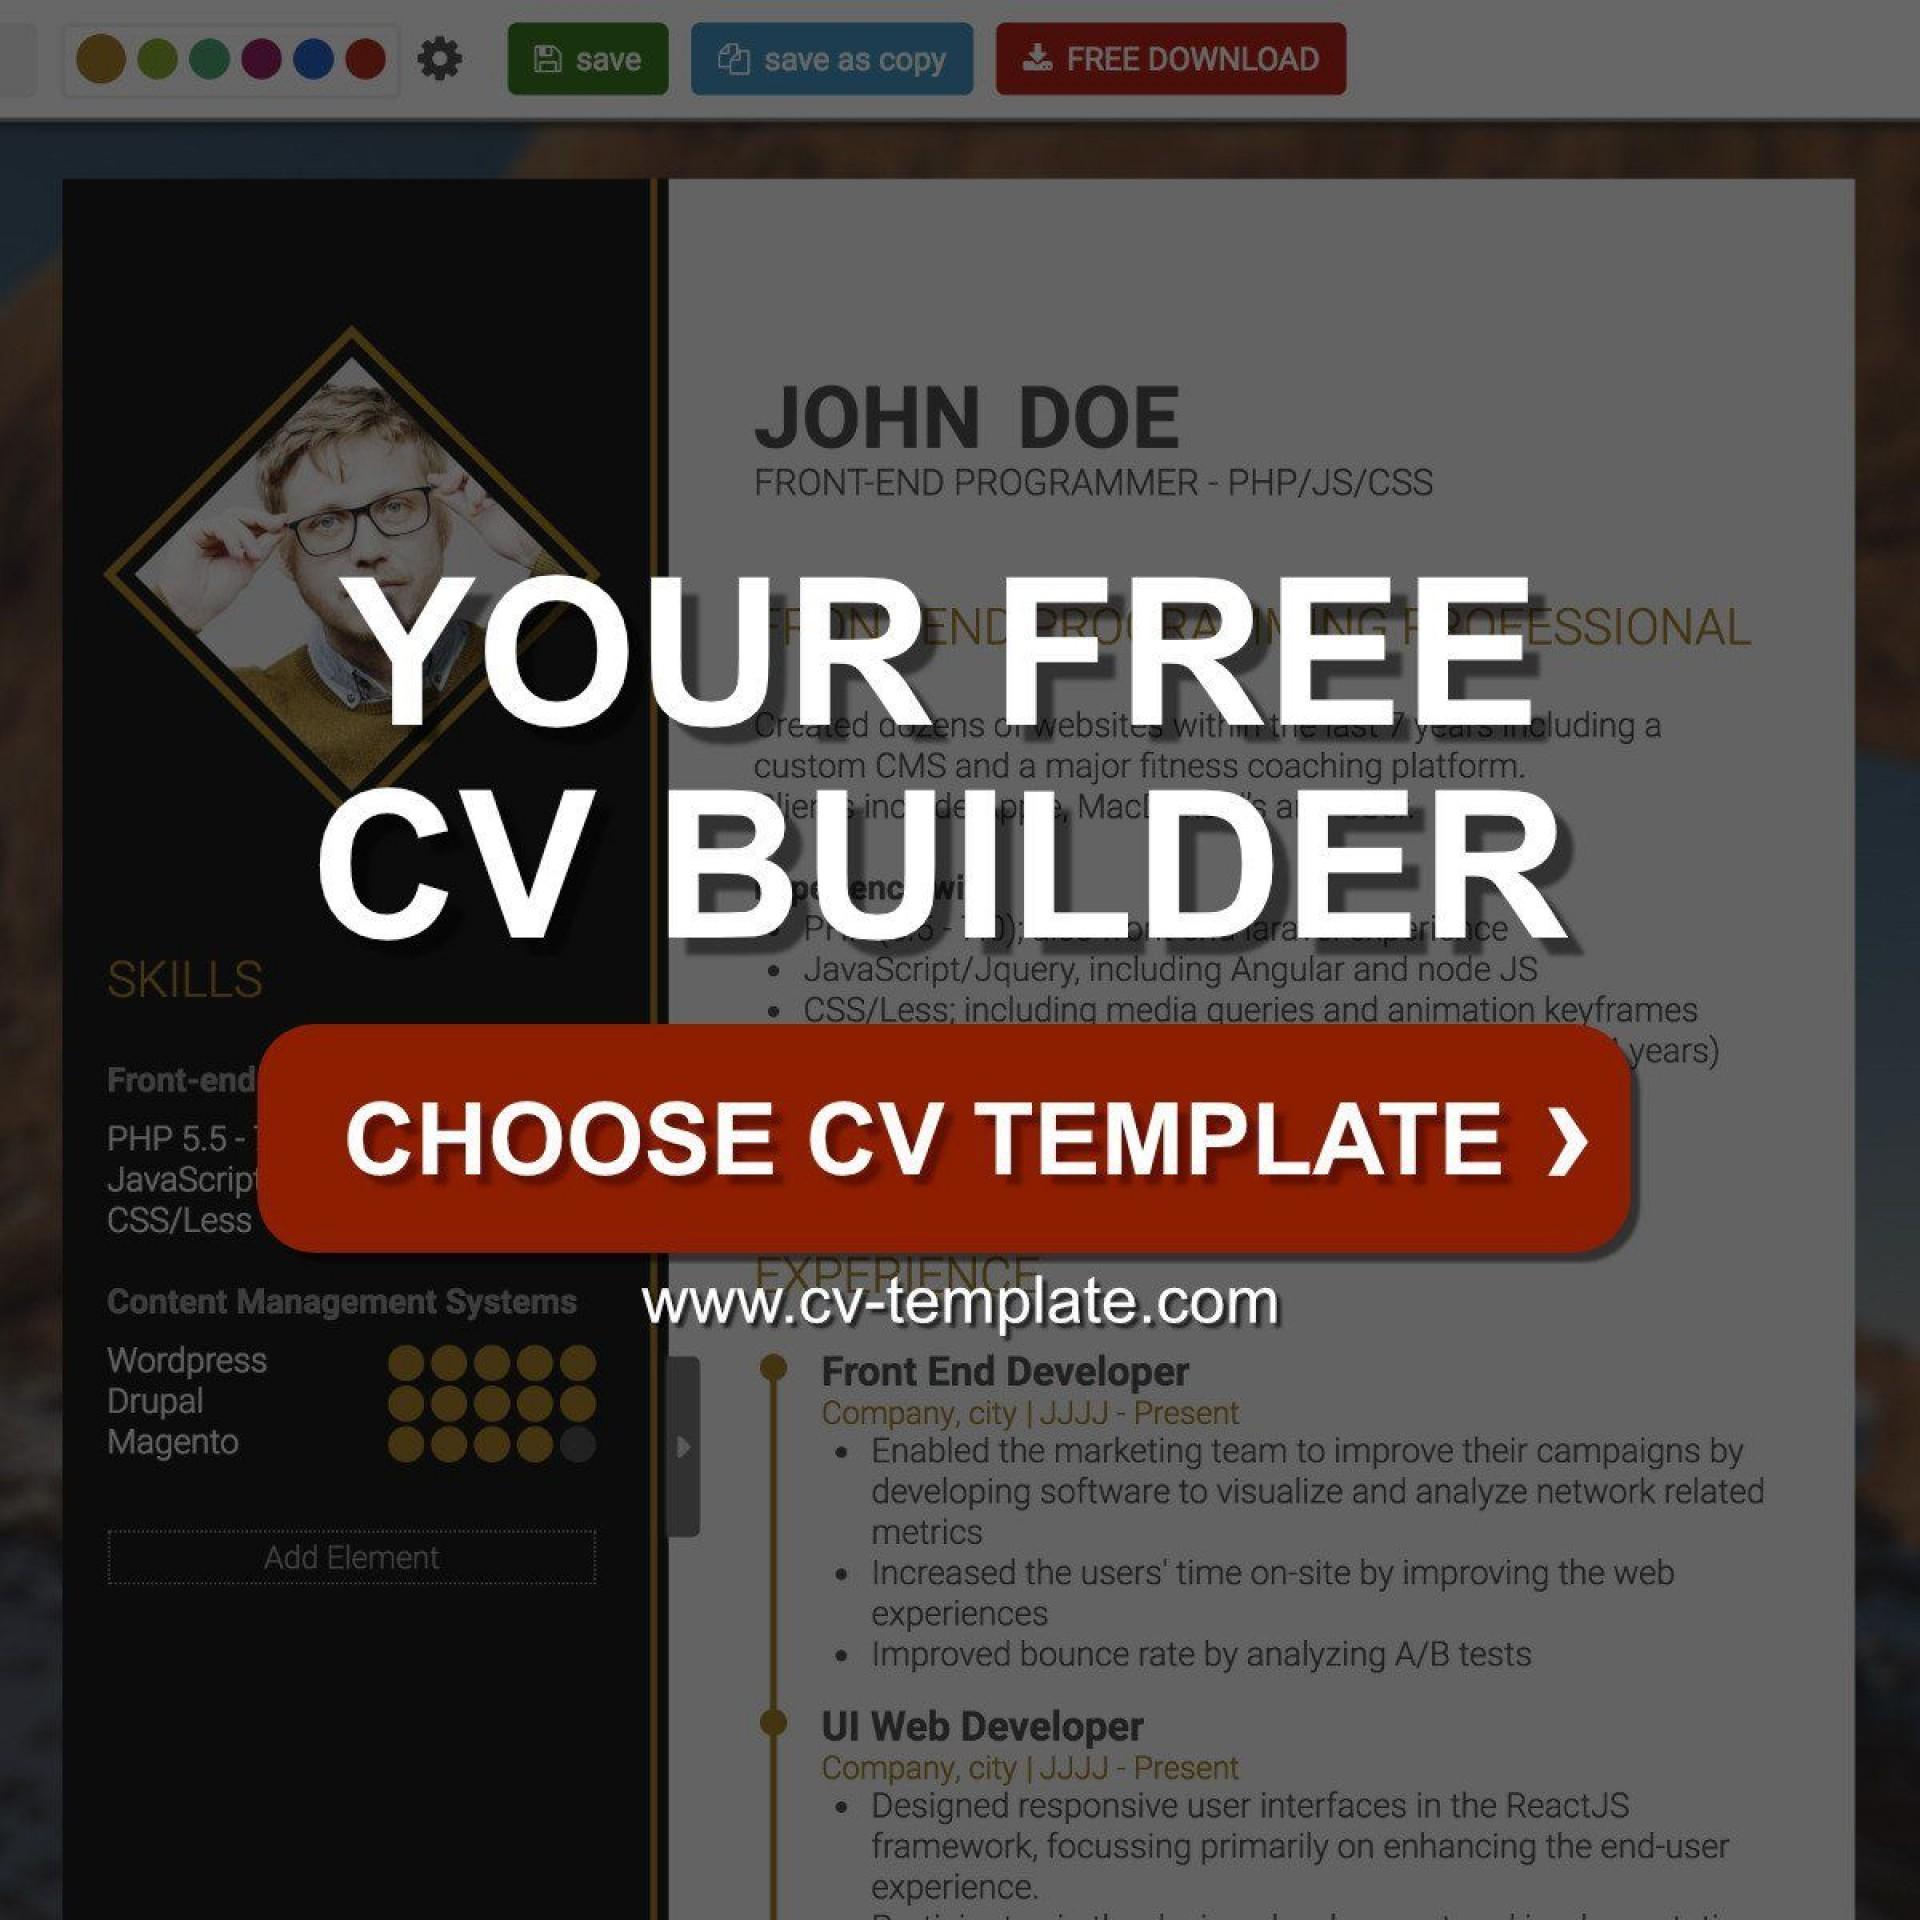 004 Shocking Professional Cv Template Free Online Photo  Resume1920